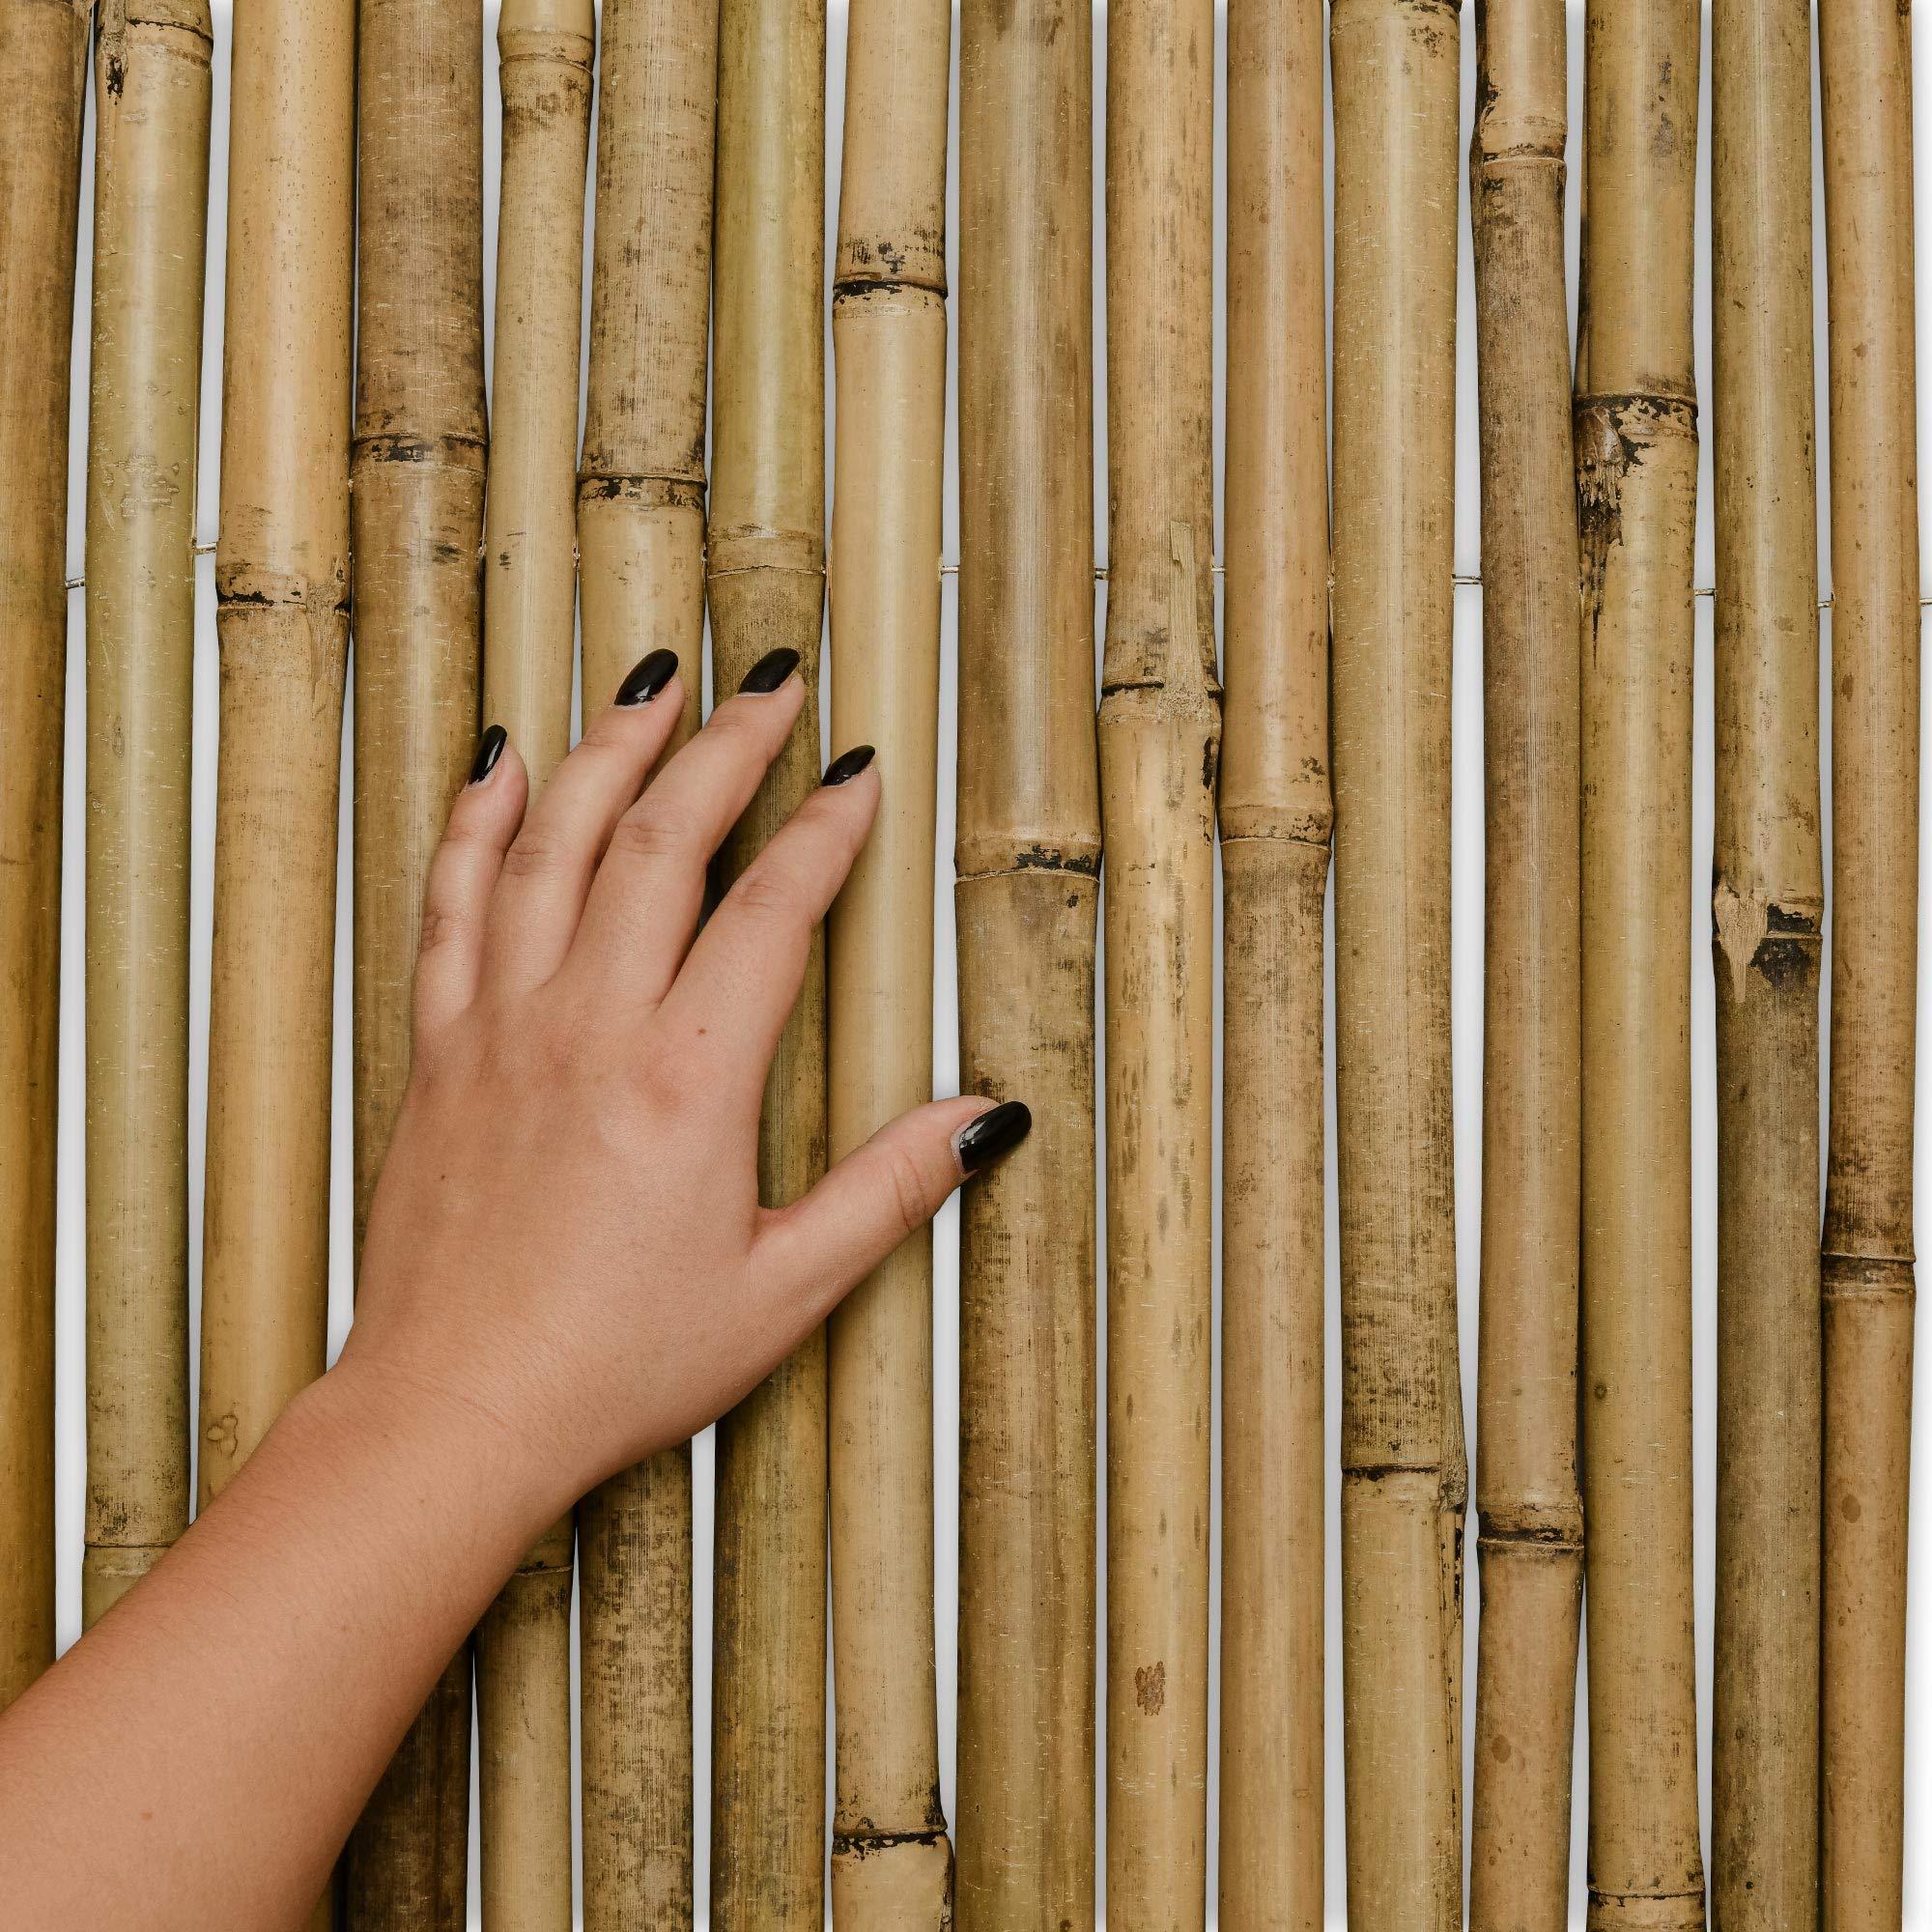 Sol Royal Valla de bambú Protectora SolVision B38 100 x 250 cm (A ...